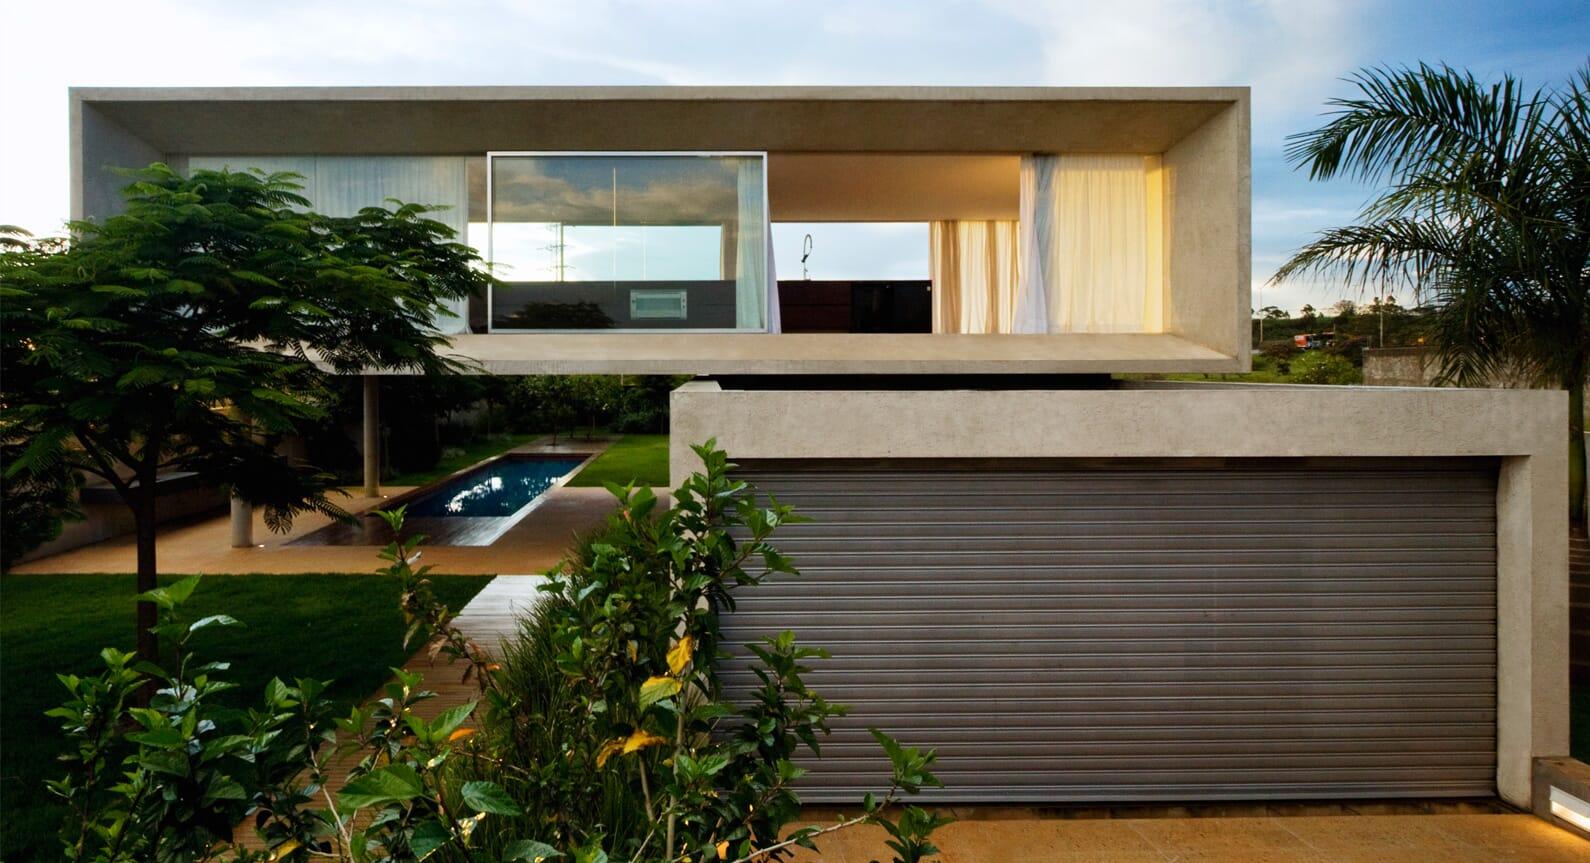 Studio MK27 Takes Inspiration From Brazilian Modernism For The Osler House